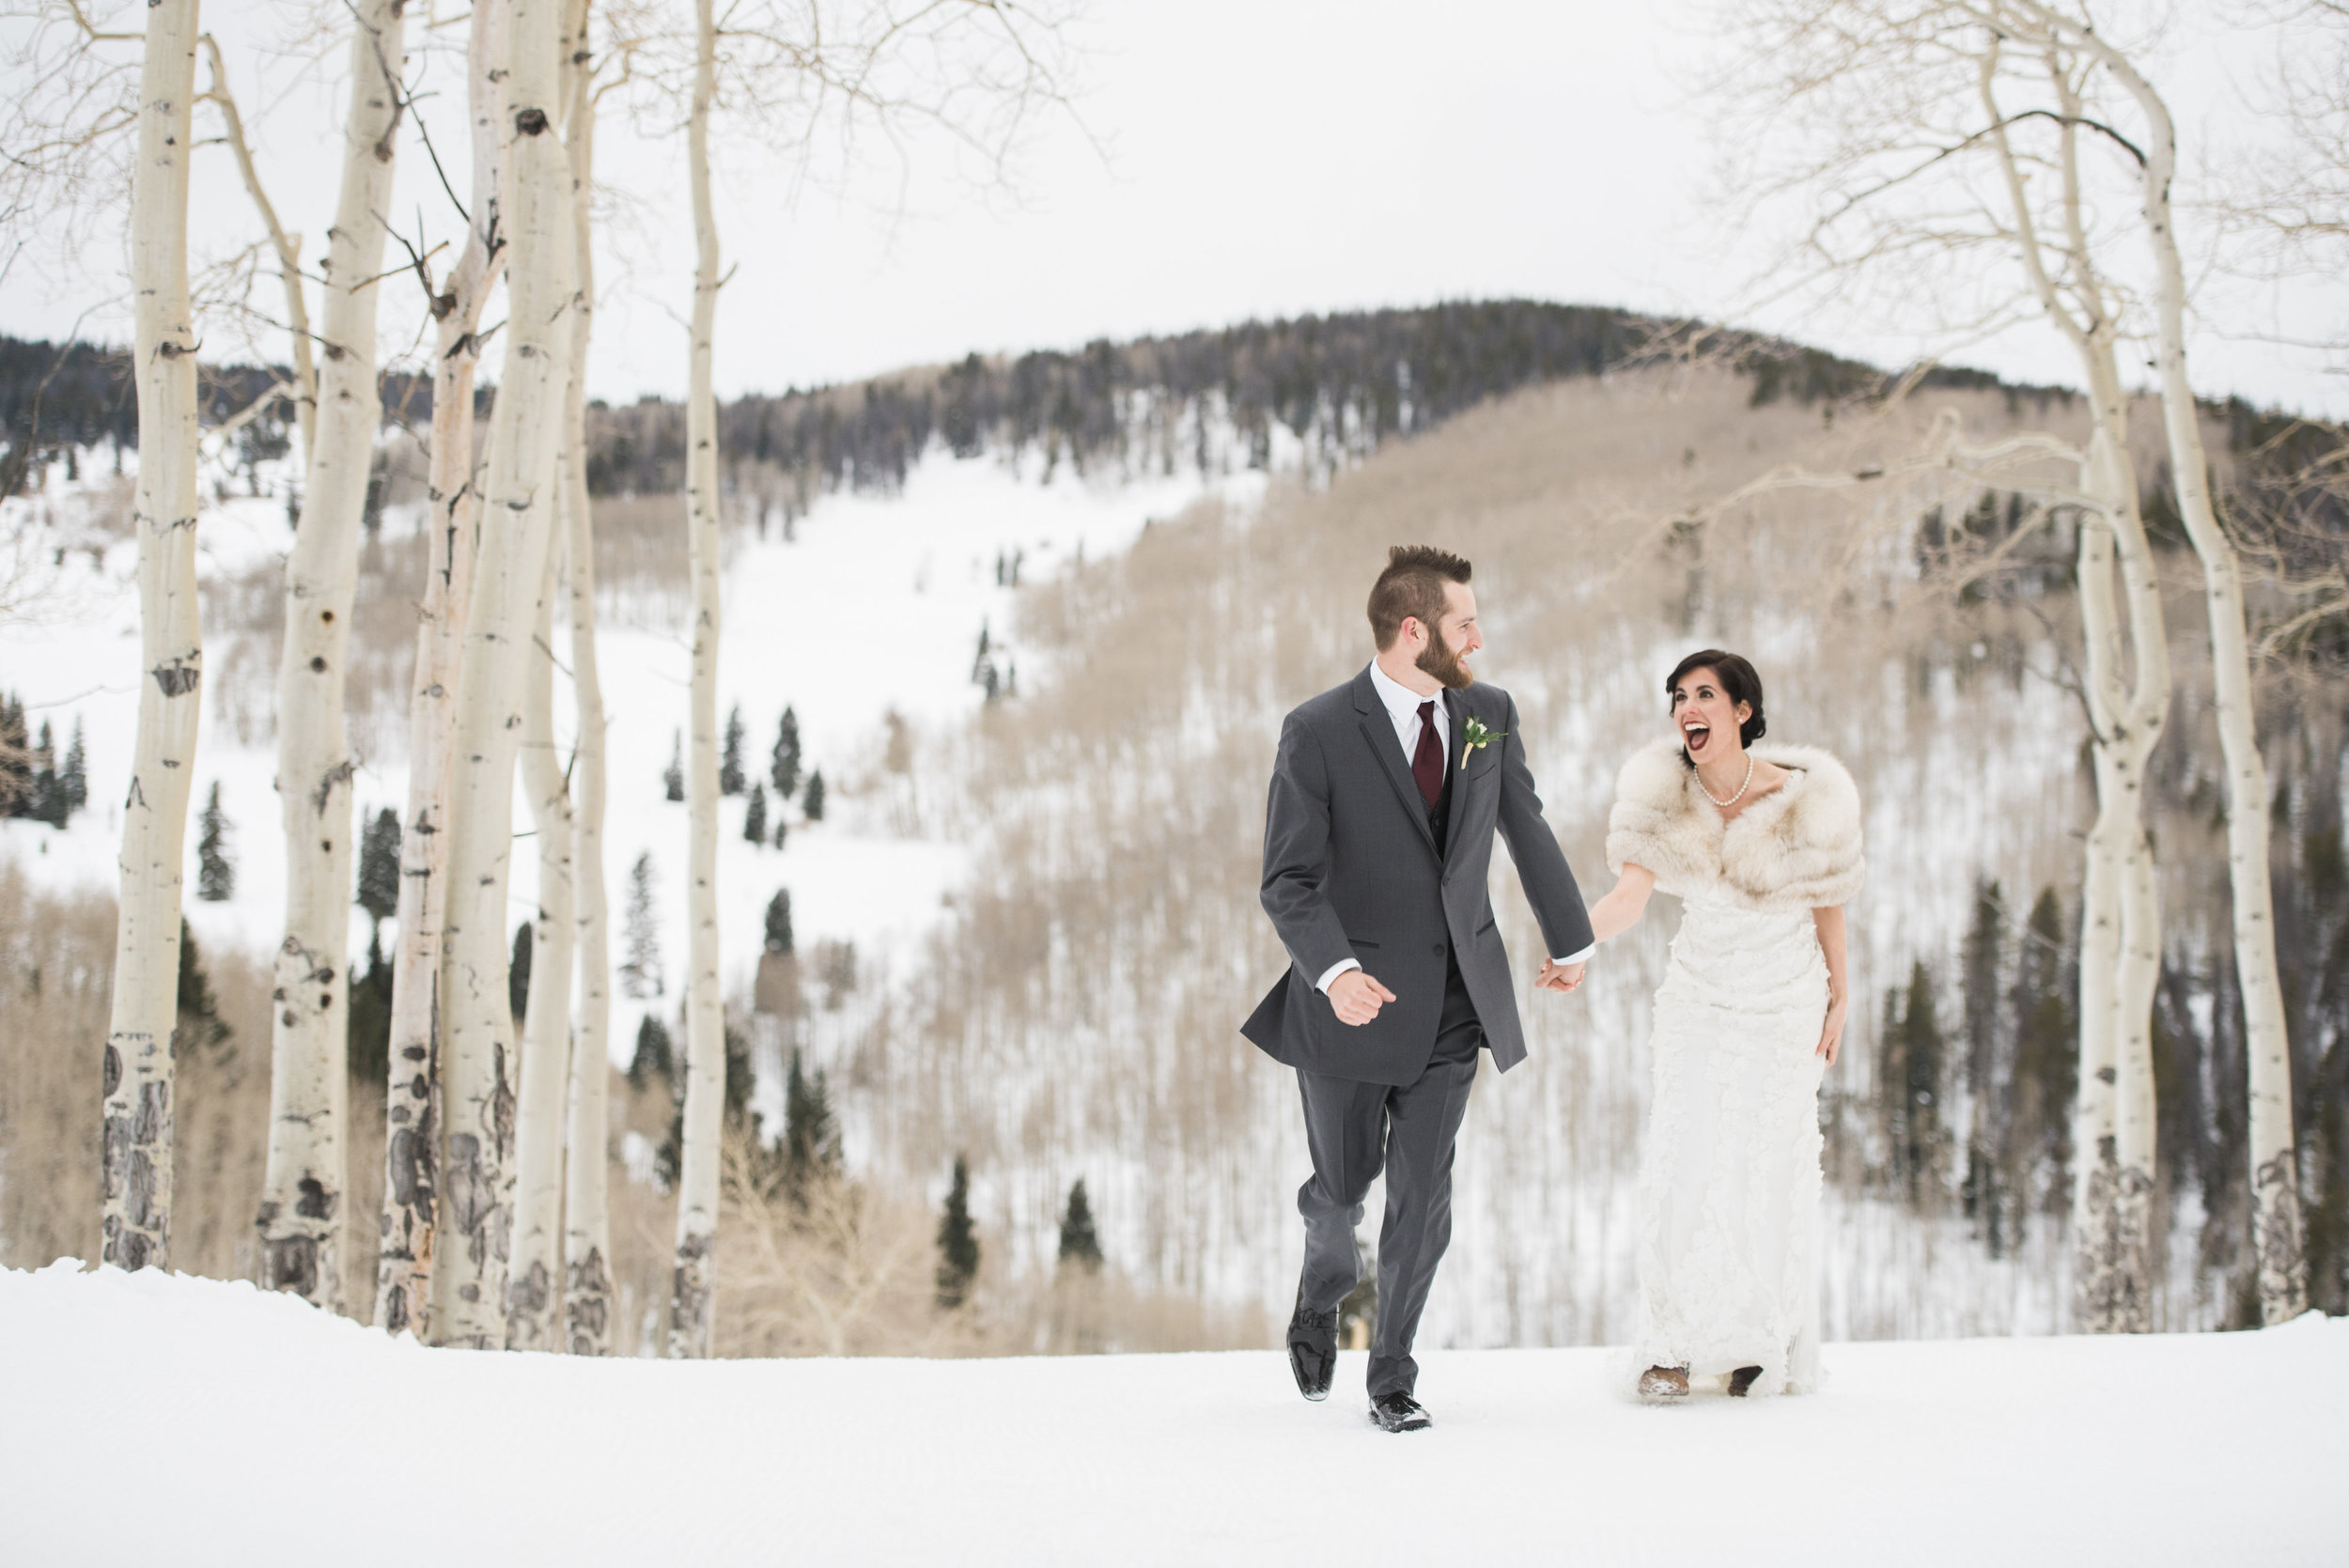 Beaver Creek Mountain wedding | Robert Bullock Bride gown and Love veil from Little White Dress Bridal Shop in Denver | Ali & Garrett Wedding Photographers